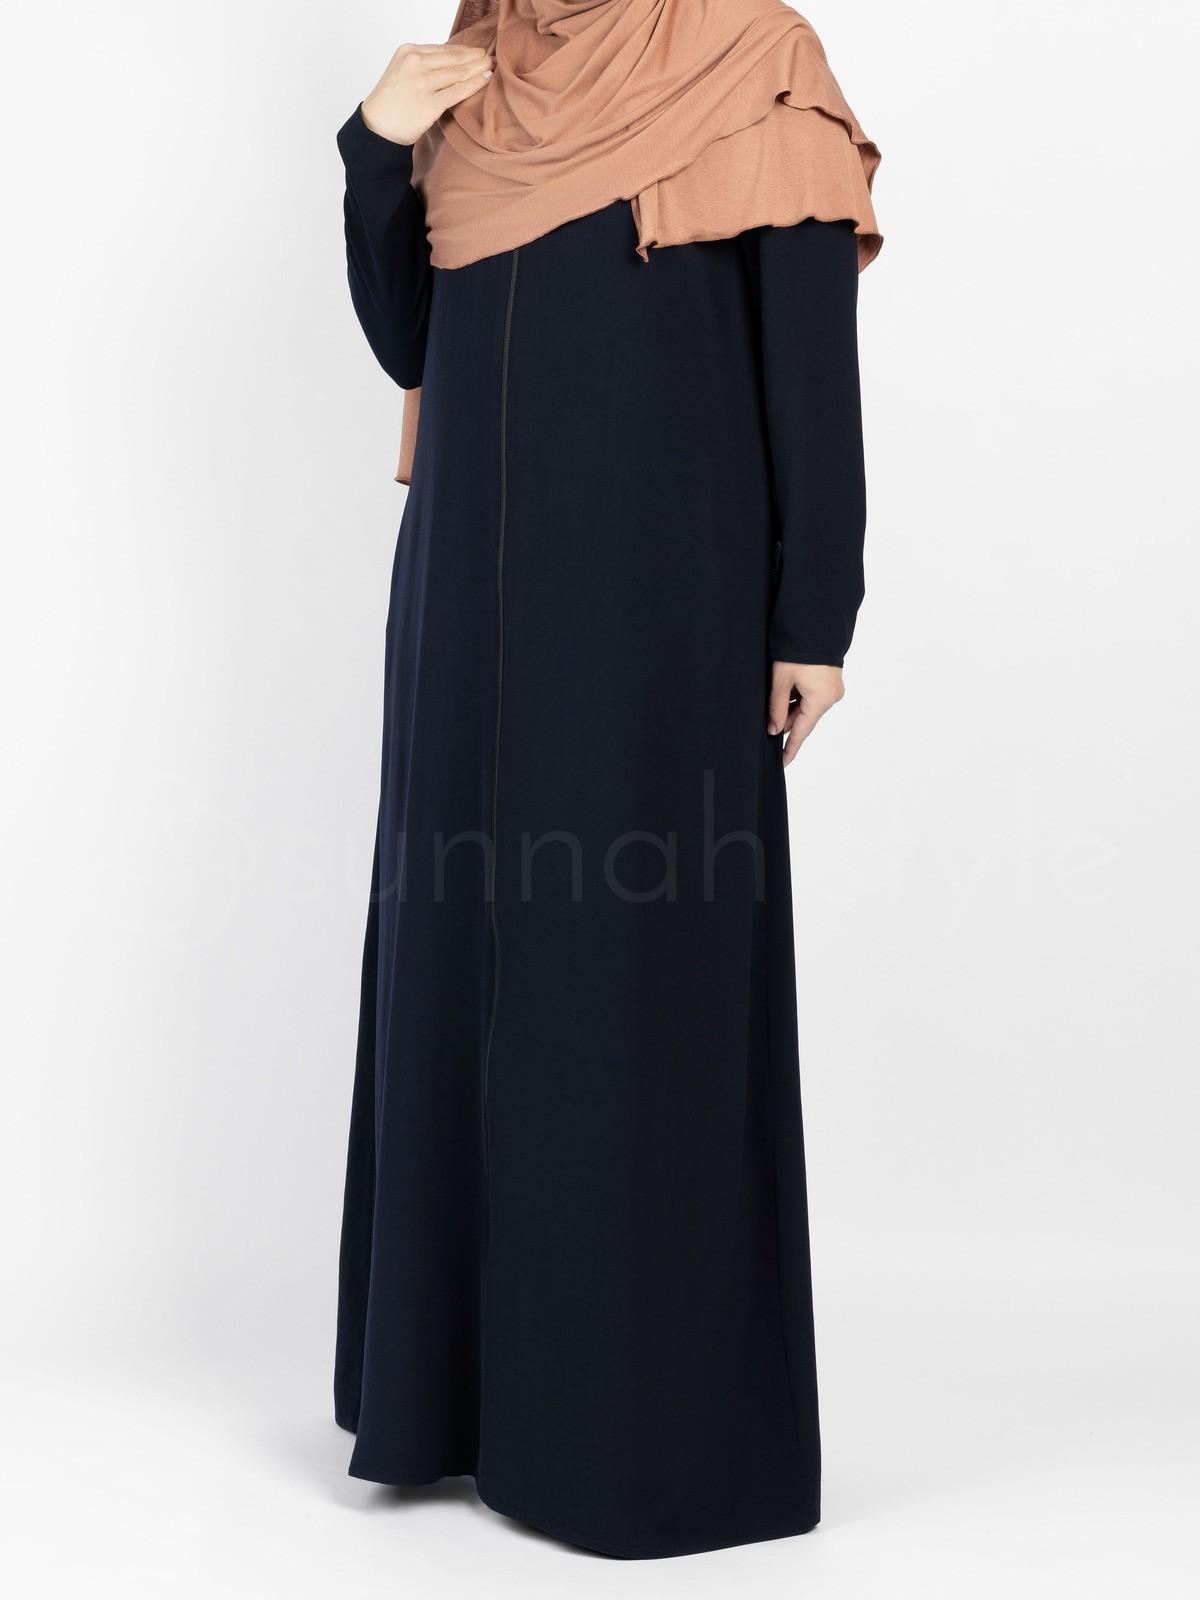 Sunnah Style - Essentials Full Zip Abaya - SLIM (Navy Blue)